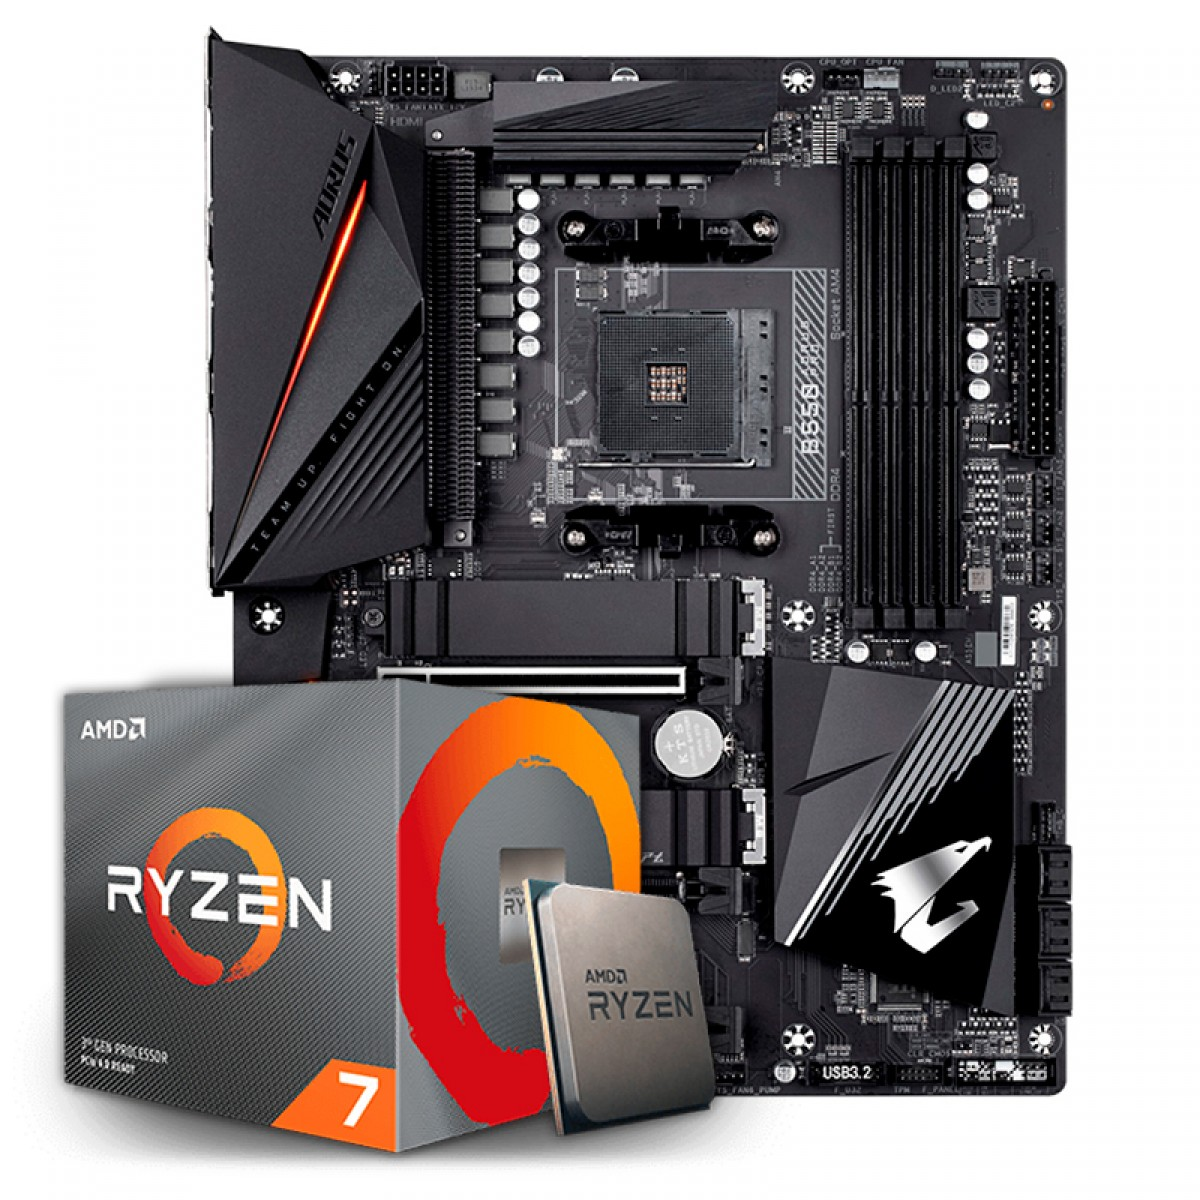 Kit Upgrade, AMD Ryzen 7 3700X, Gigabyte B550 Aorus Pro